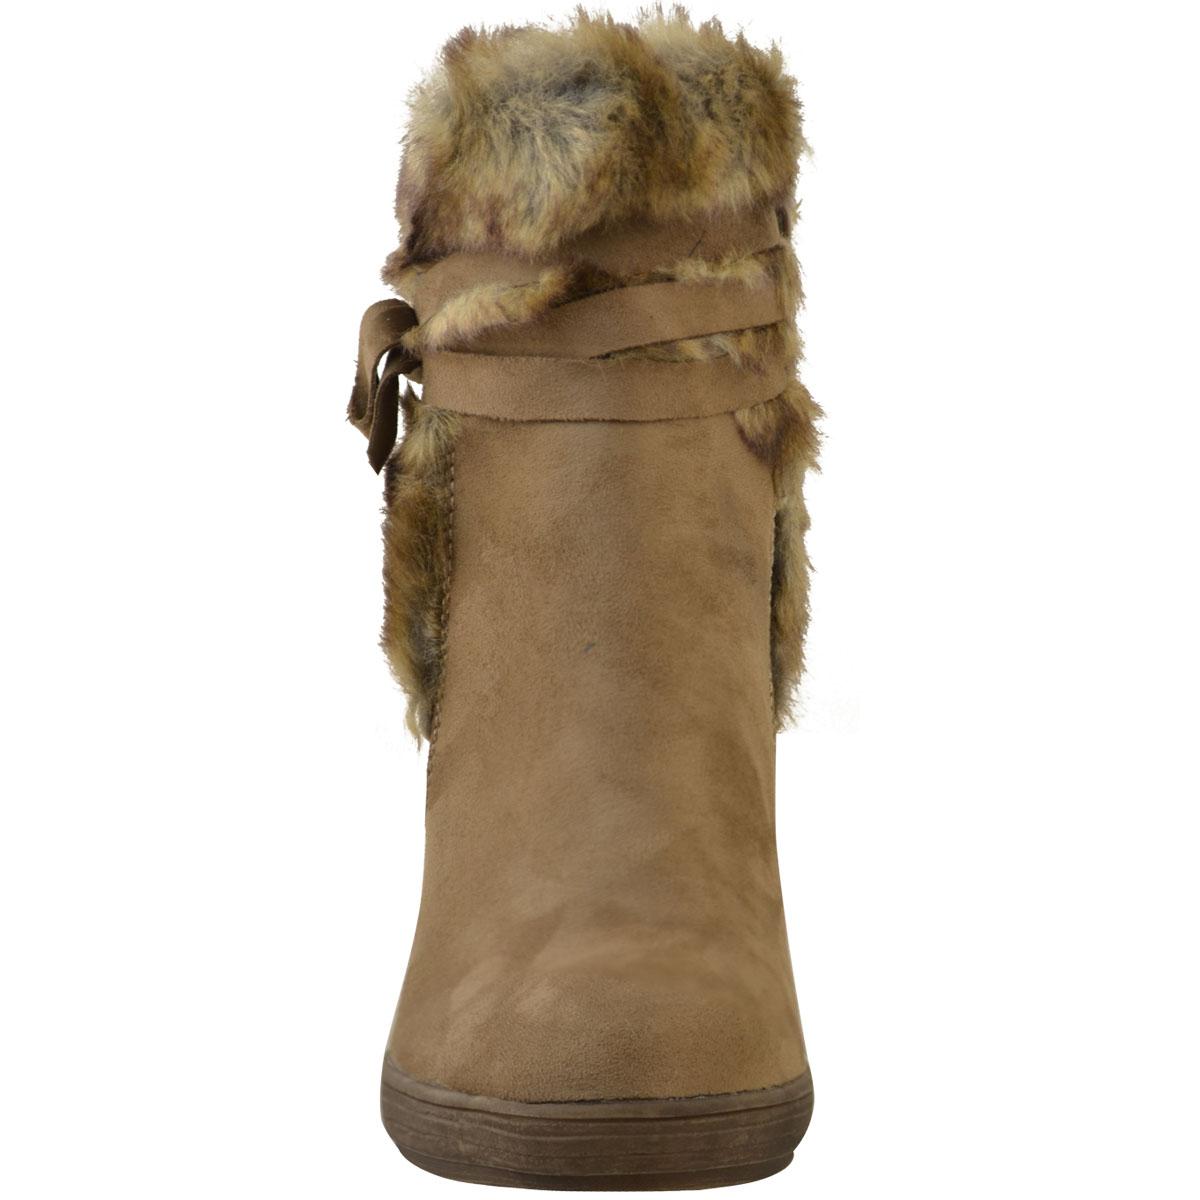 Womens-Ladies-Wedge-Low-Heel-Winter-Knee-Boots-Warm-Faux-Fur-Fleece-Size-UK thumbnail 27